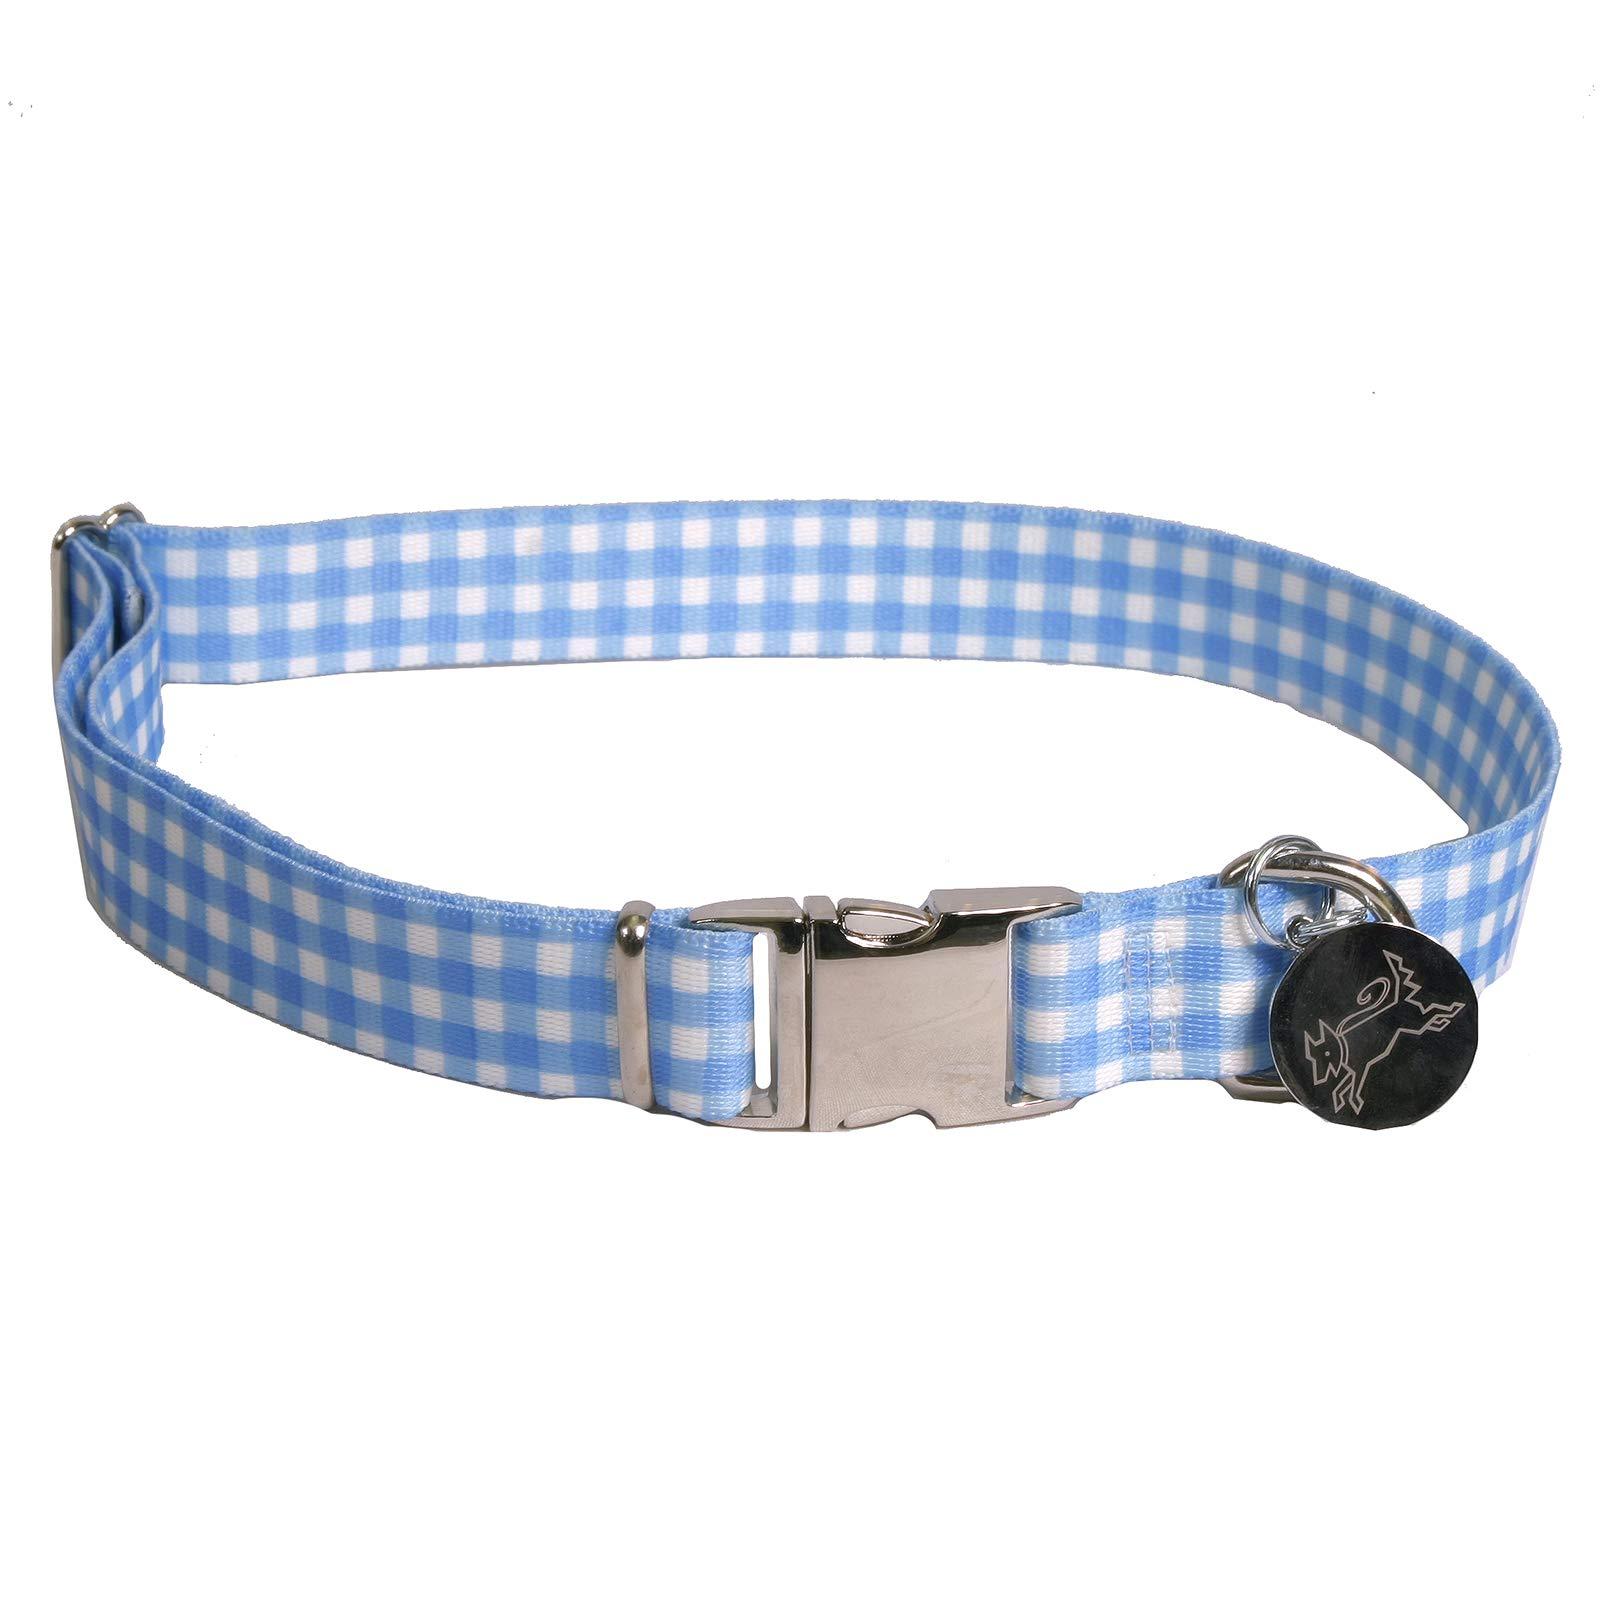 Southern Dawg Gingham Blue Premium Dog Collar - Size Medium 14'' - 20'' by Yellow Dog Design